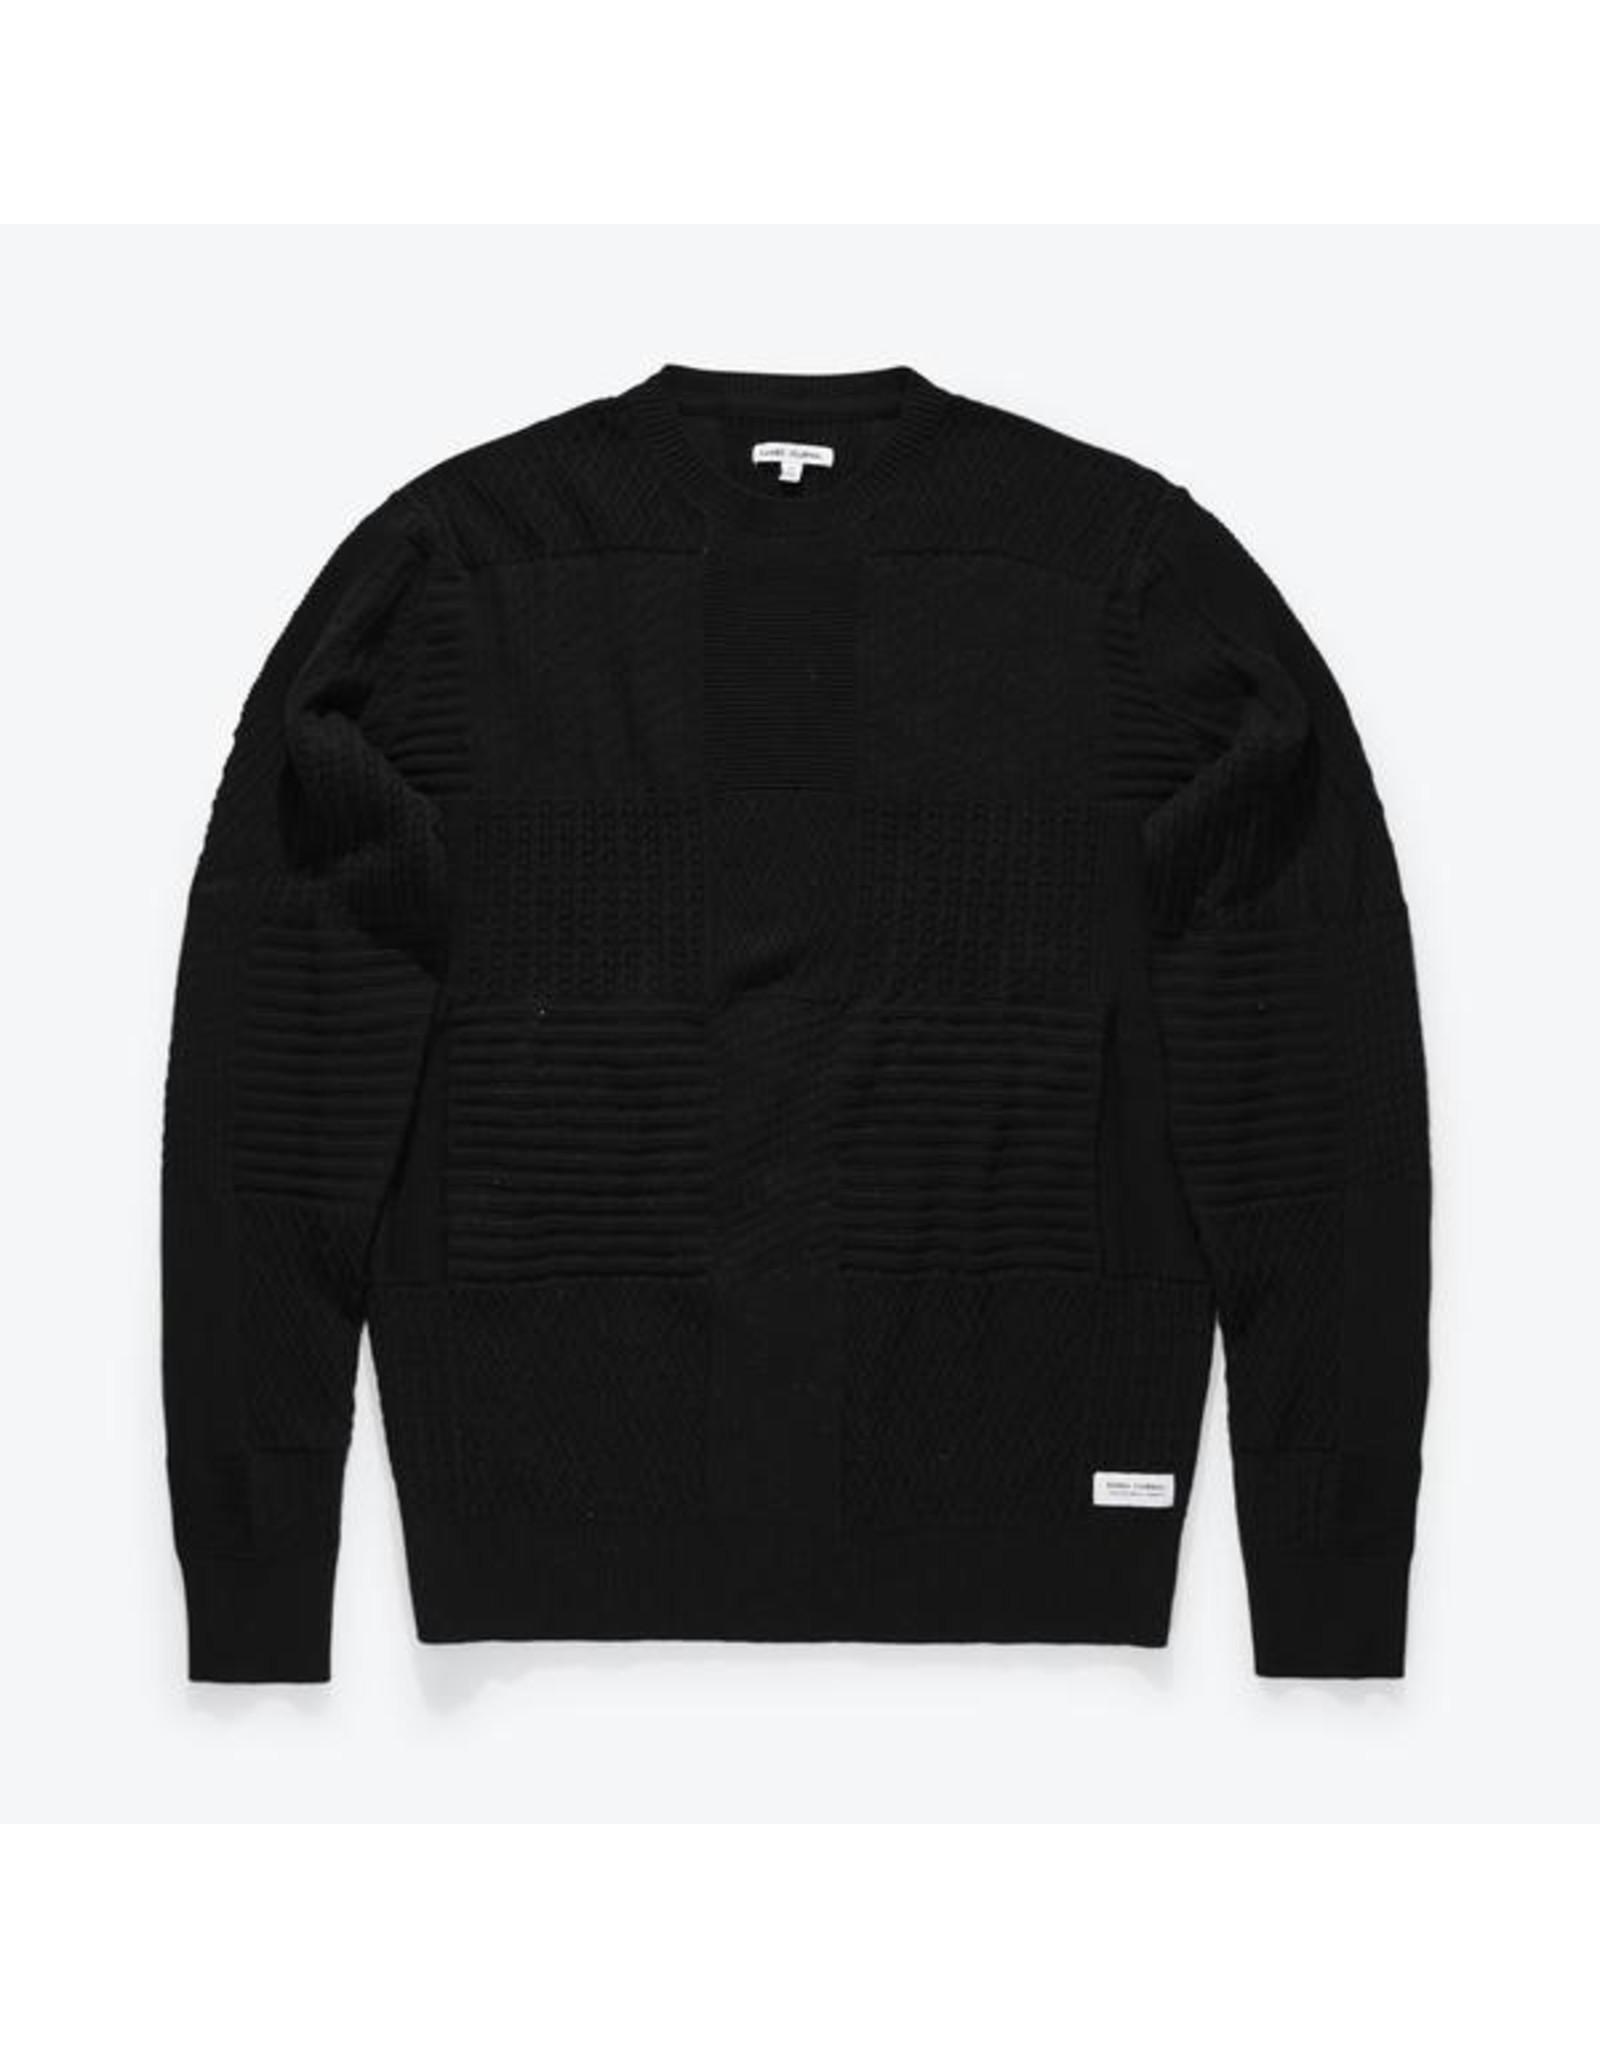 Banks Journal - Multi-Textured Sweater